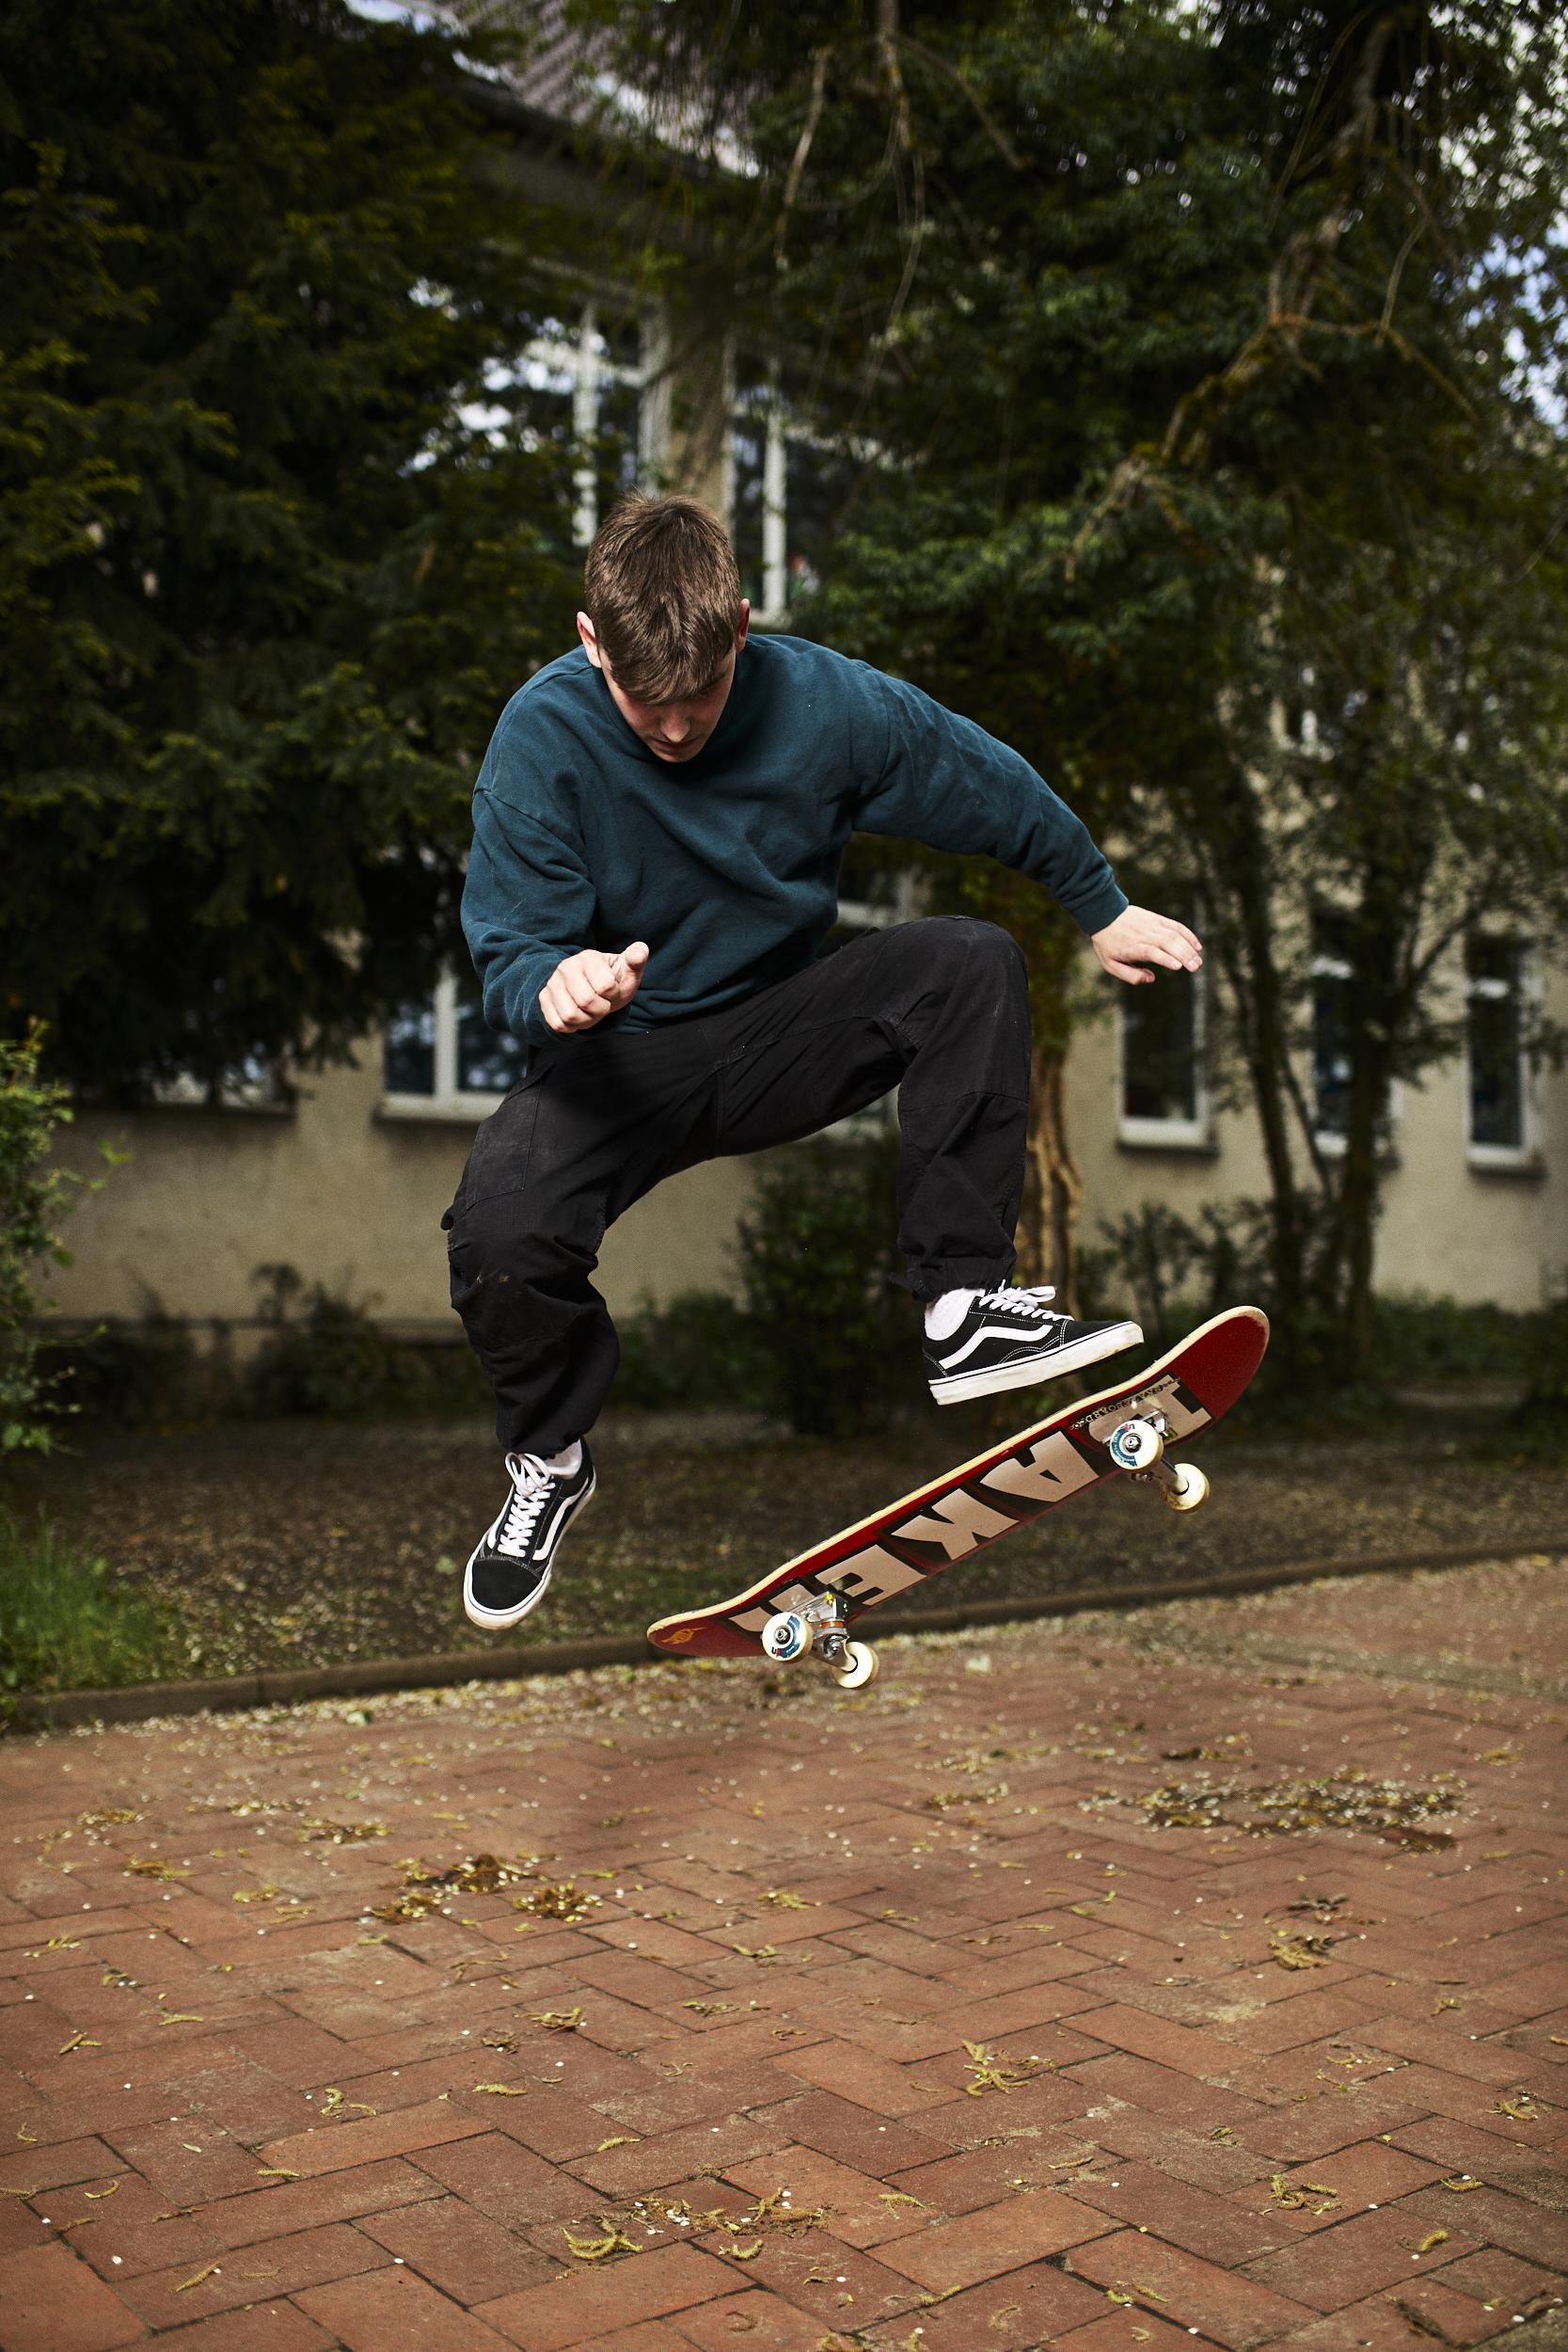 MARTINRUPIK_2021-05-23_Justin-Skate0020